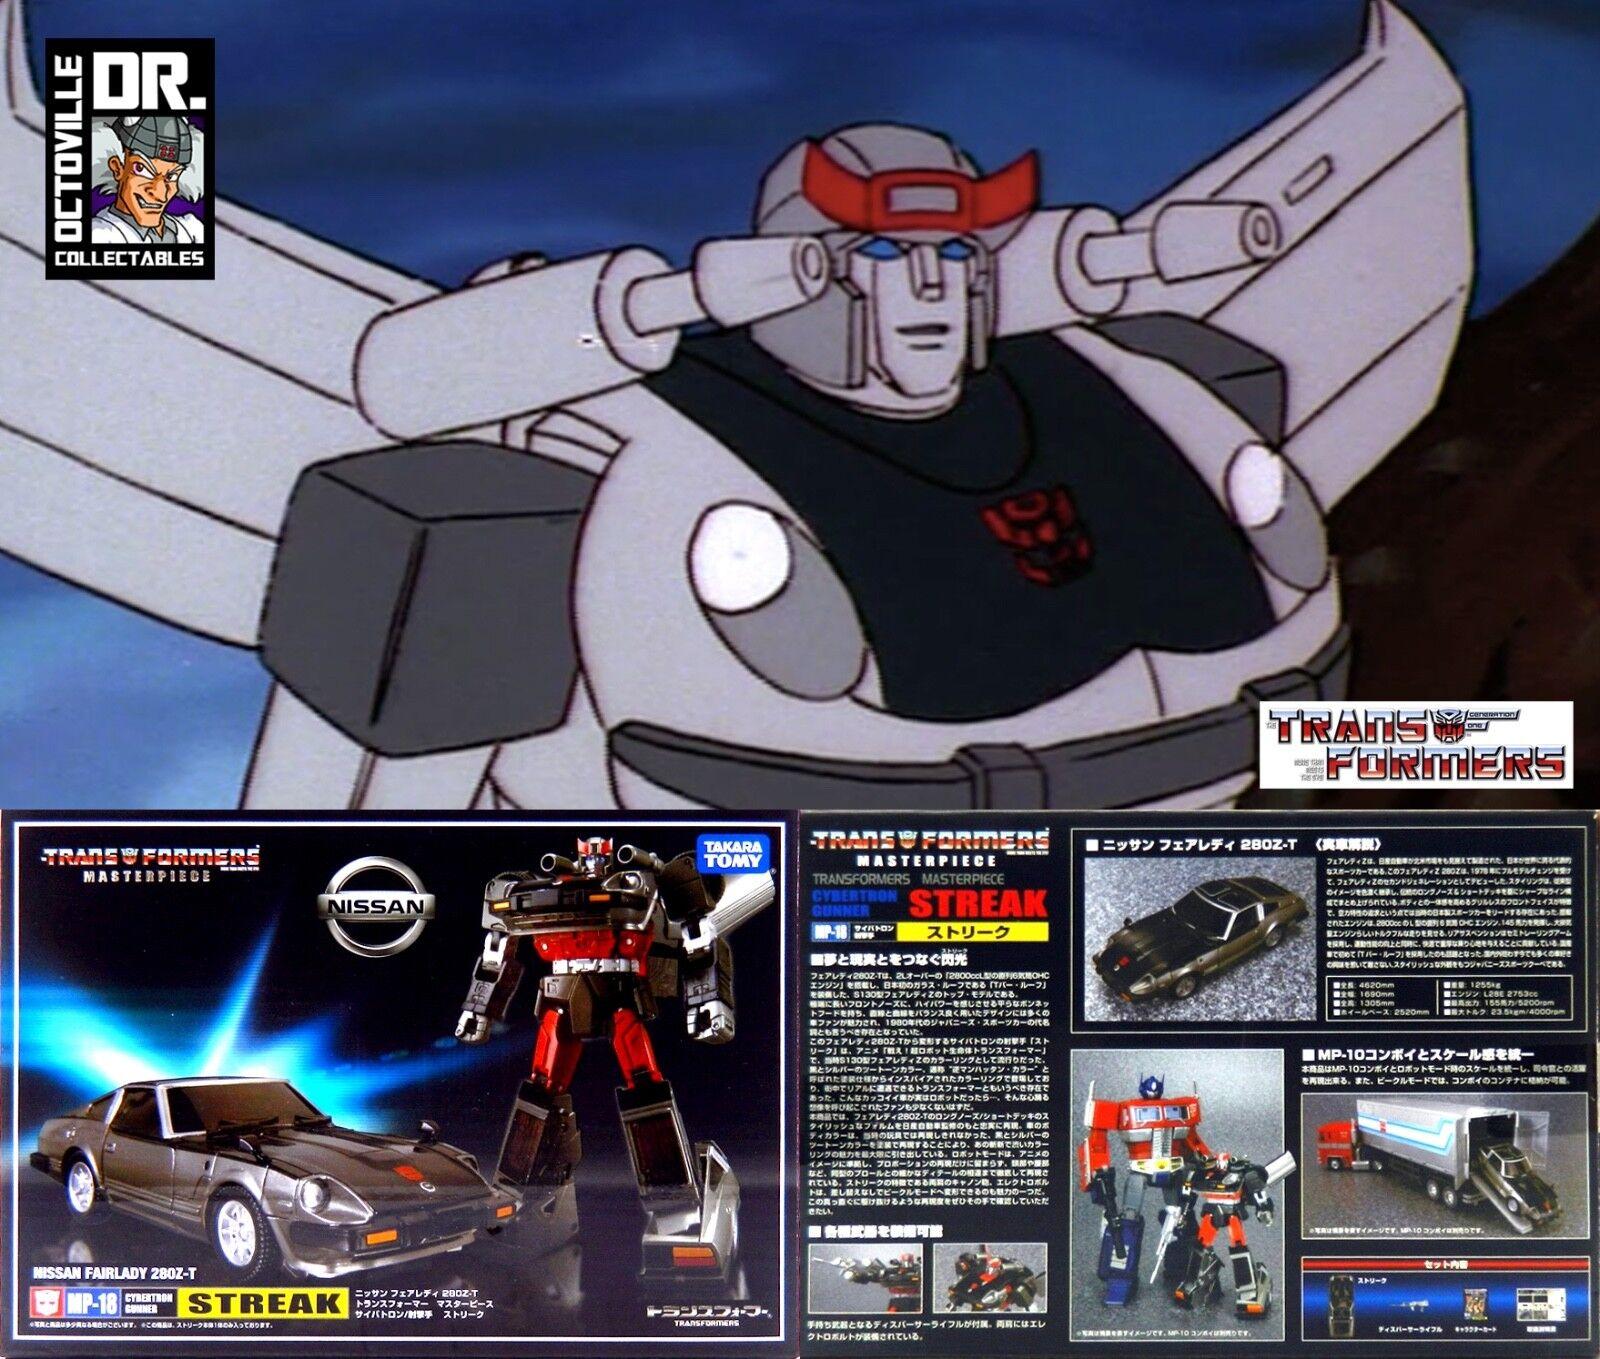 Transformers Authentic Takara Masterpiece MP-18 Streak   Sliverstreak Brand New